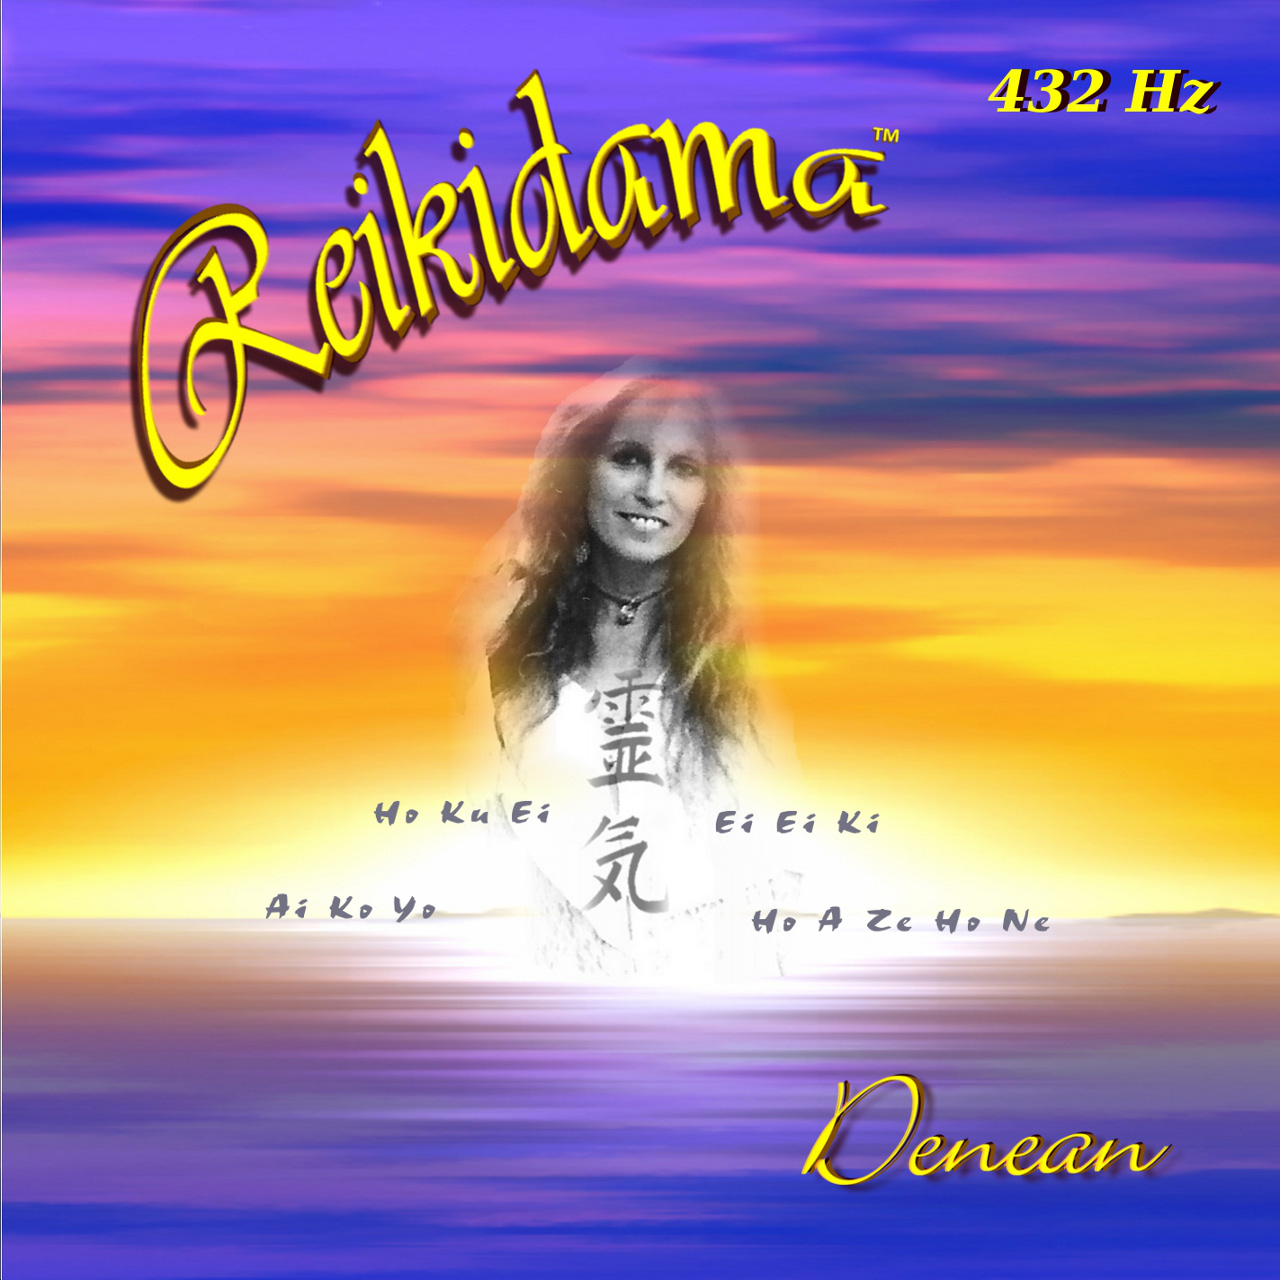 Reikidama - Denean